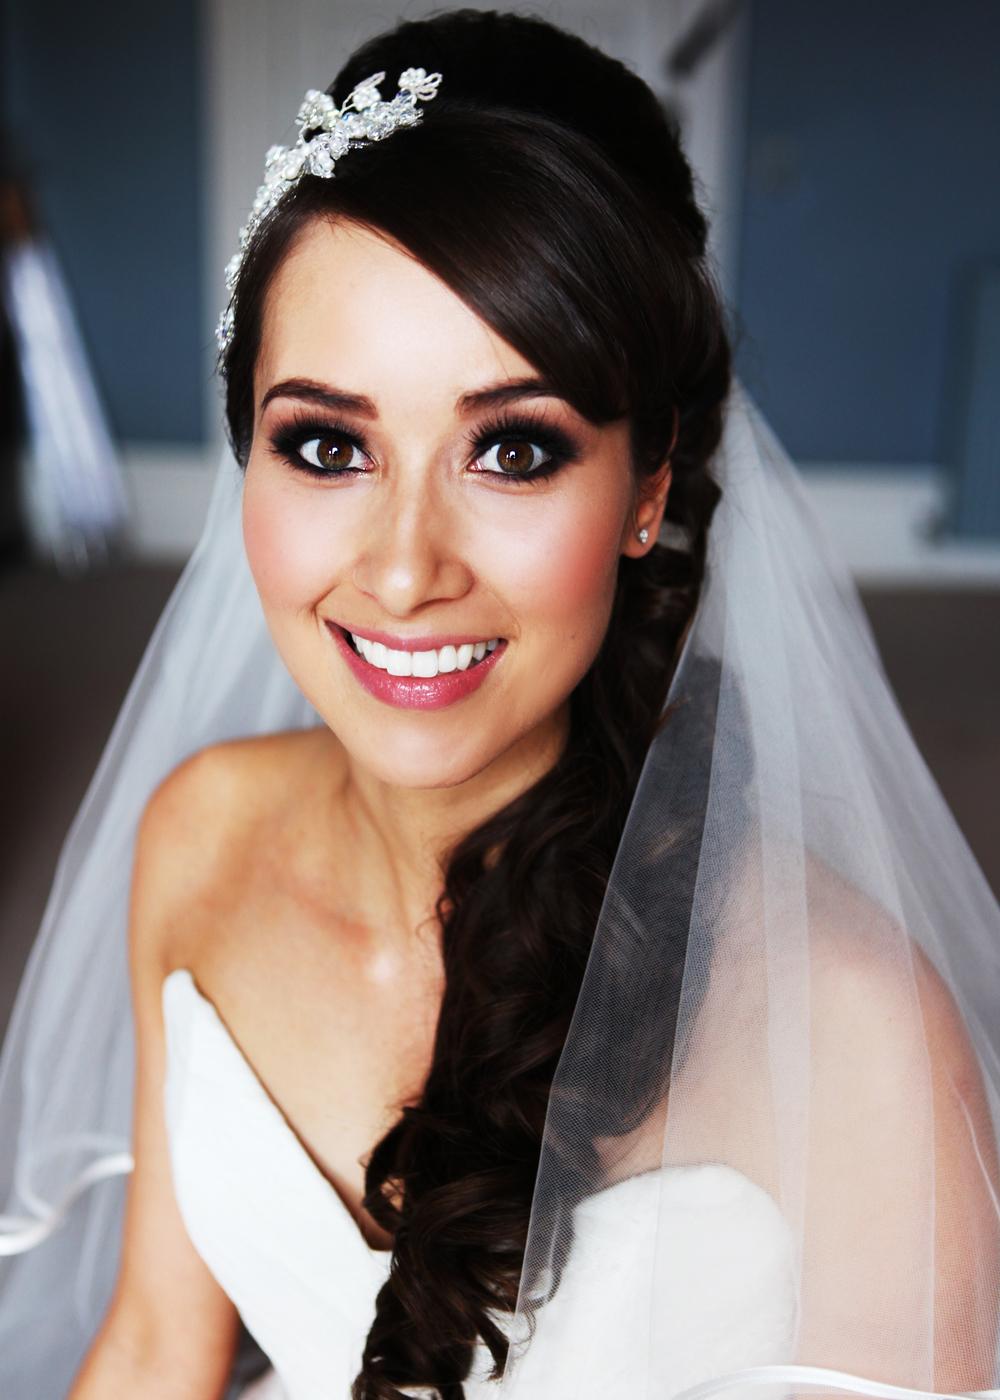 Bride cornwall wedding.JPG